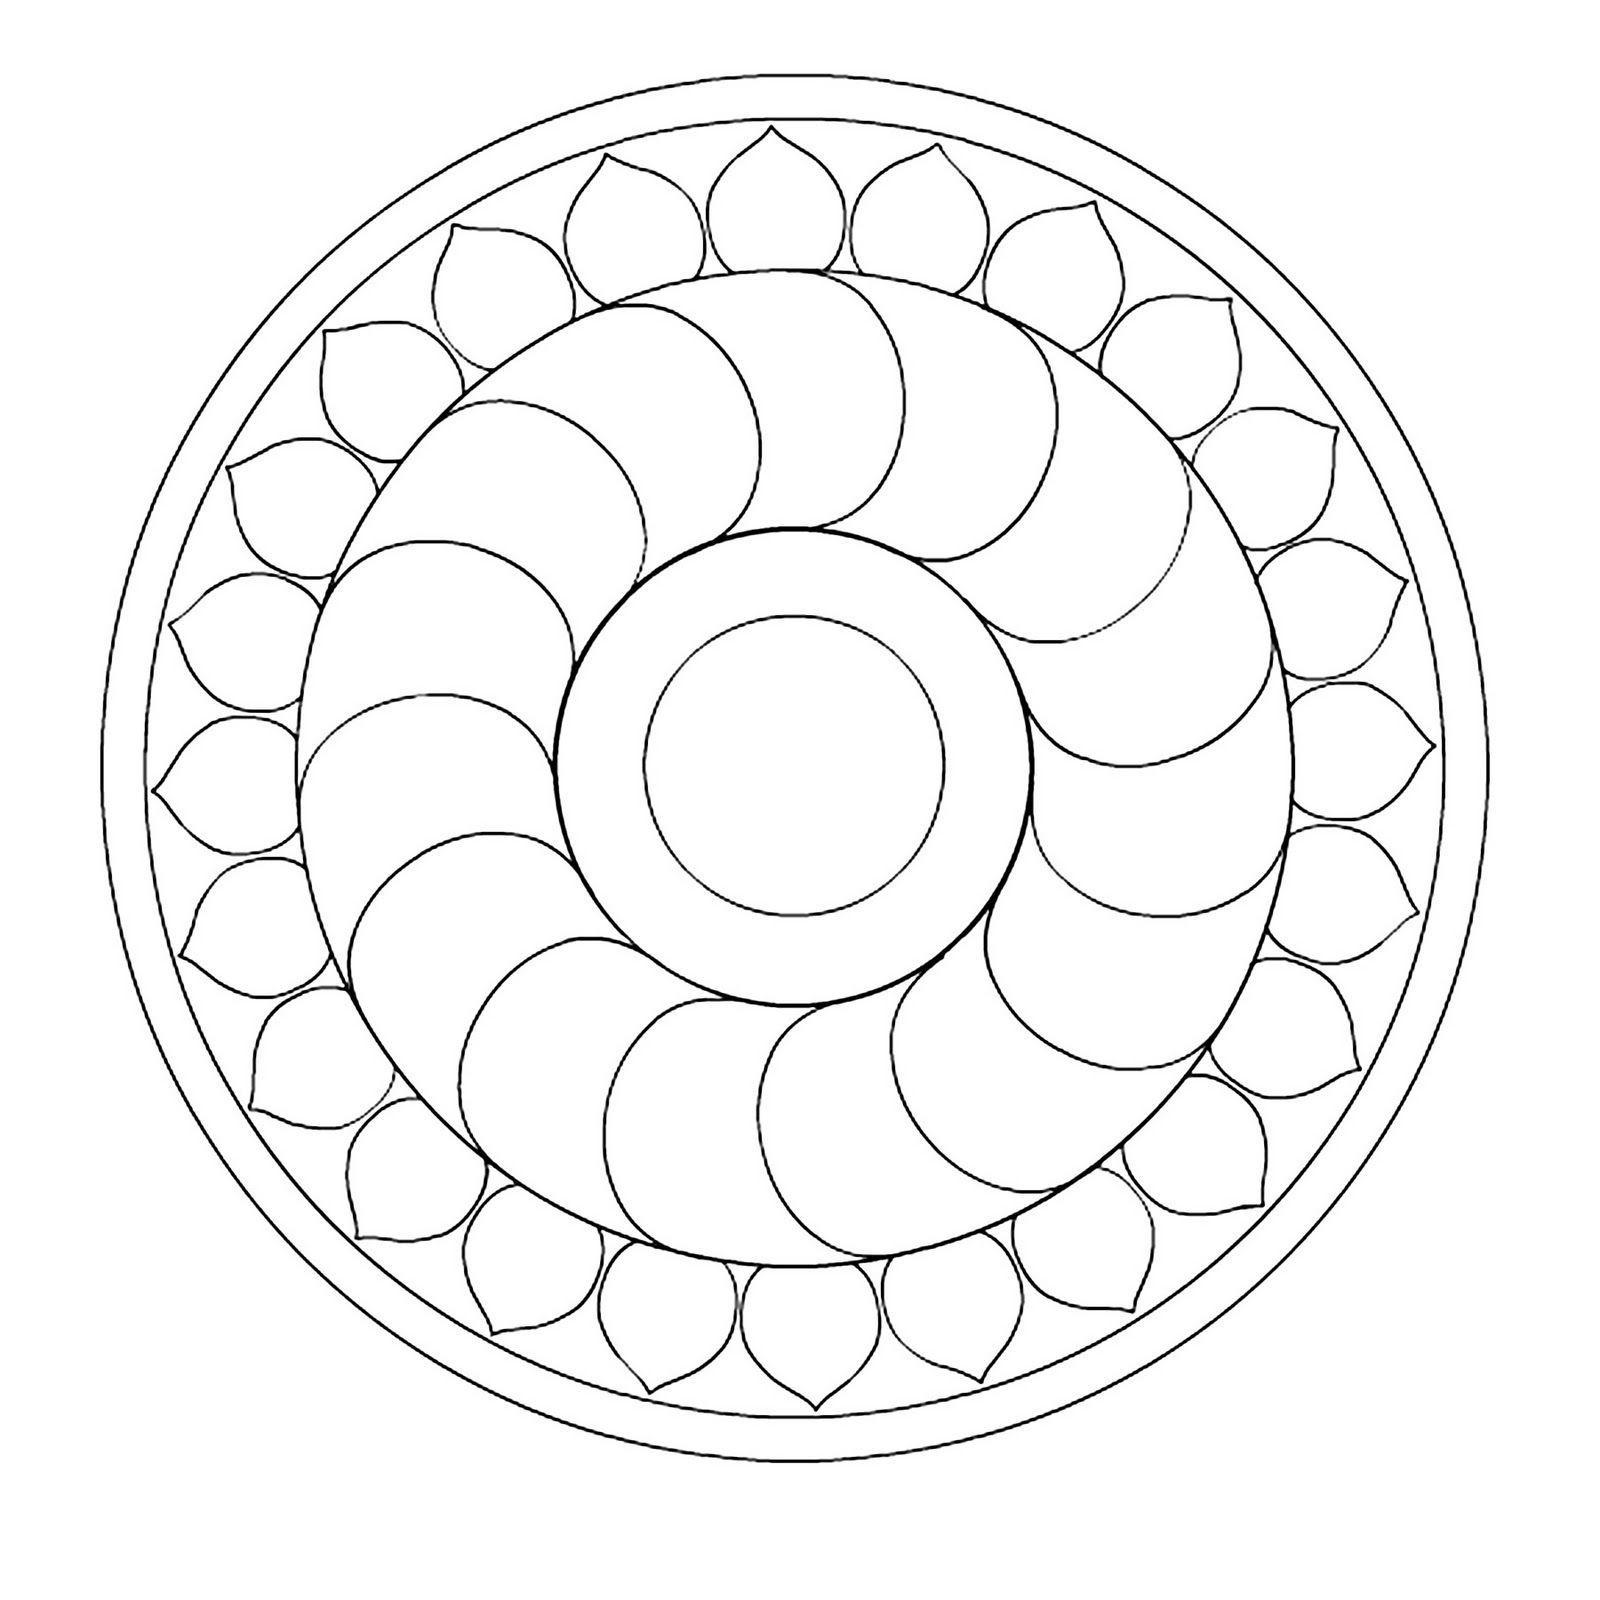 1600x1600 Mandalas Circles Of Hope Amp Healing Mandala Of The Lunar Quarter